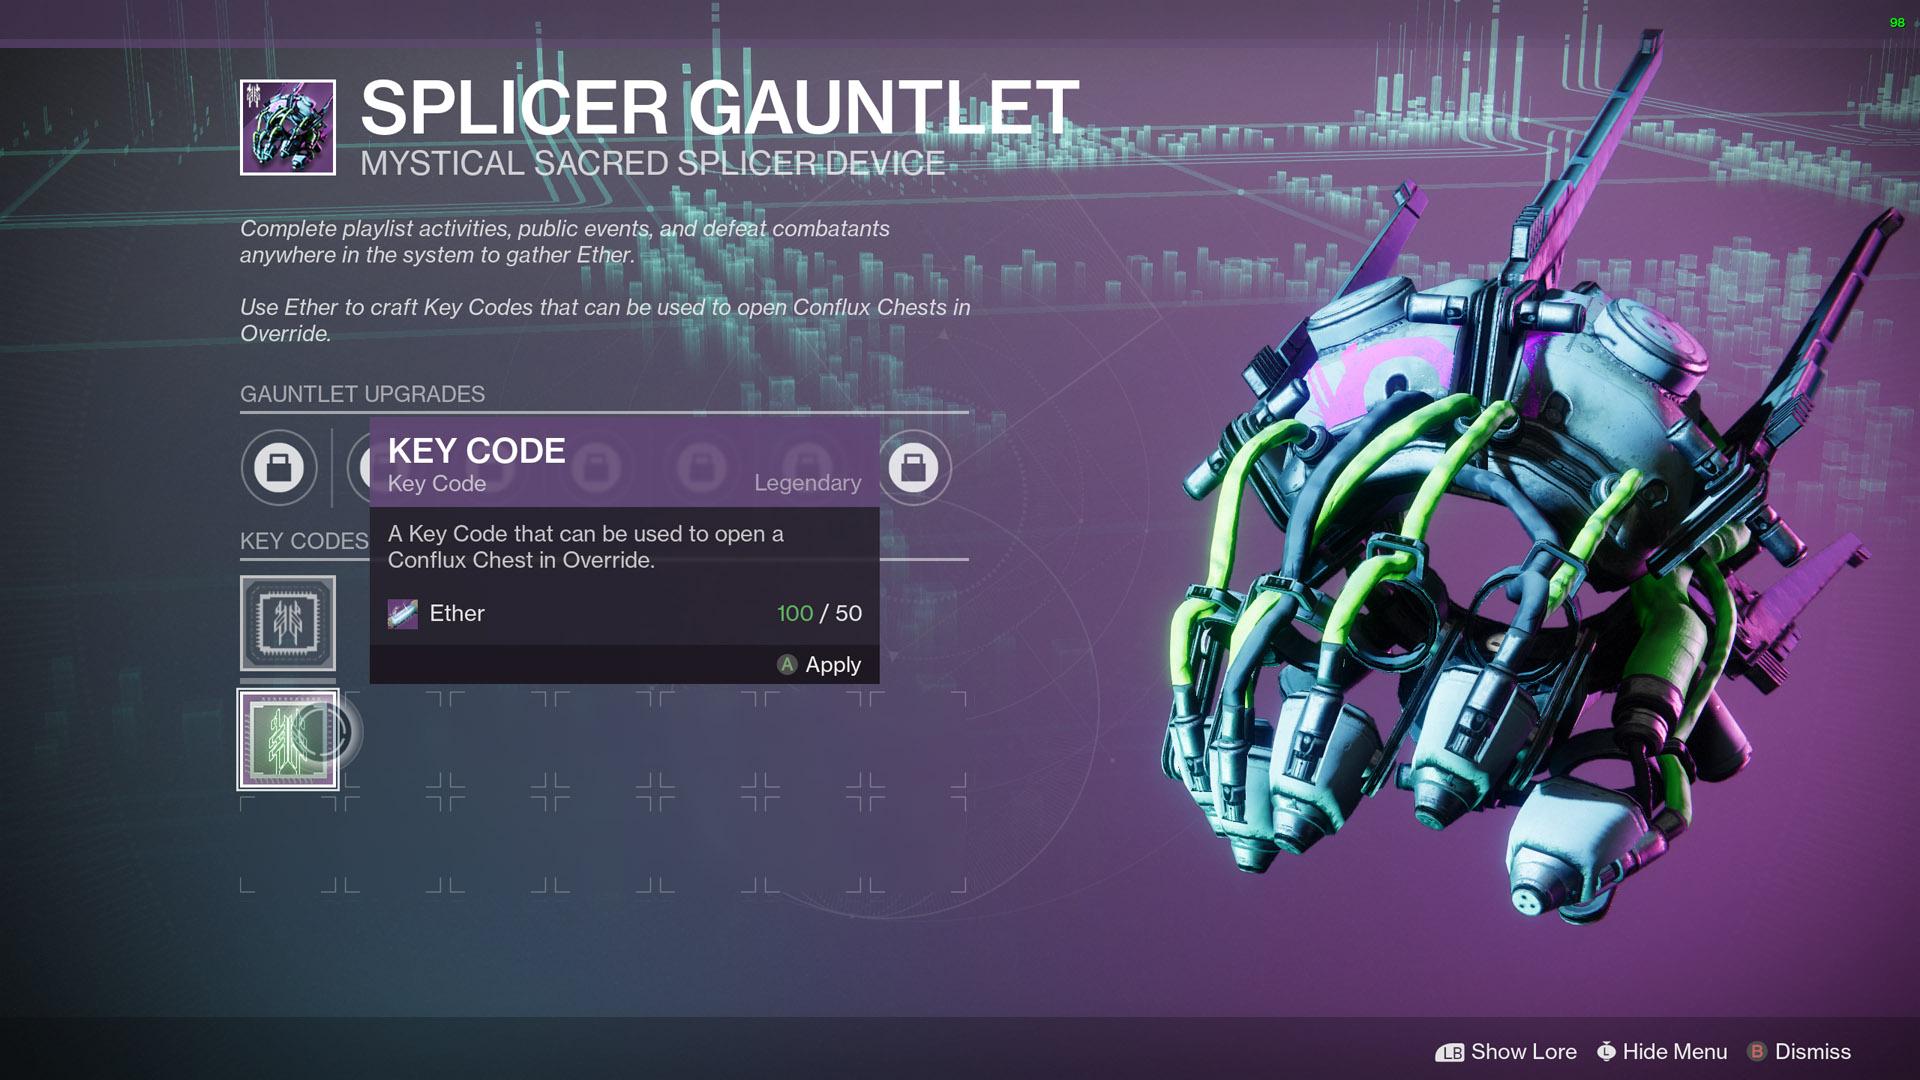 code clé du gantelet de Splicer destin 2